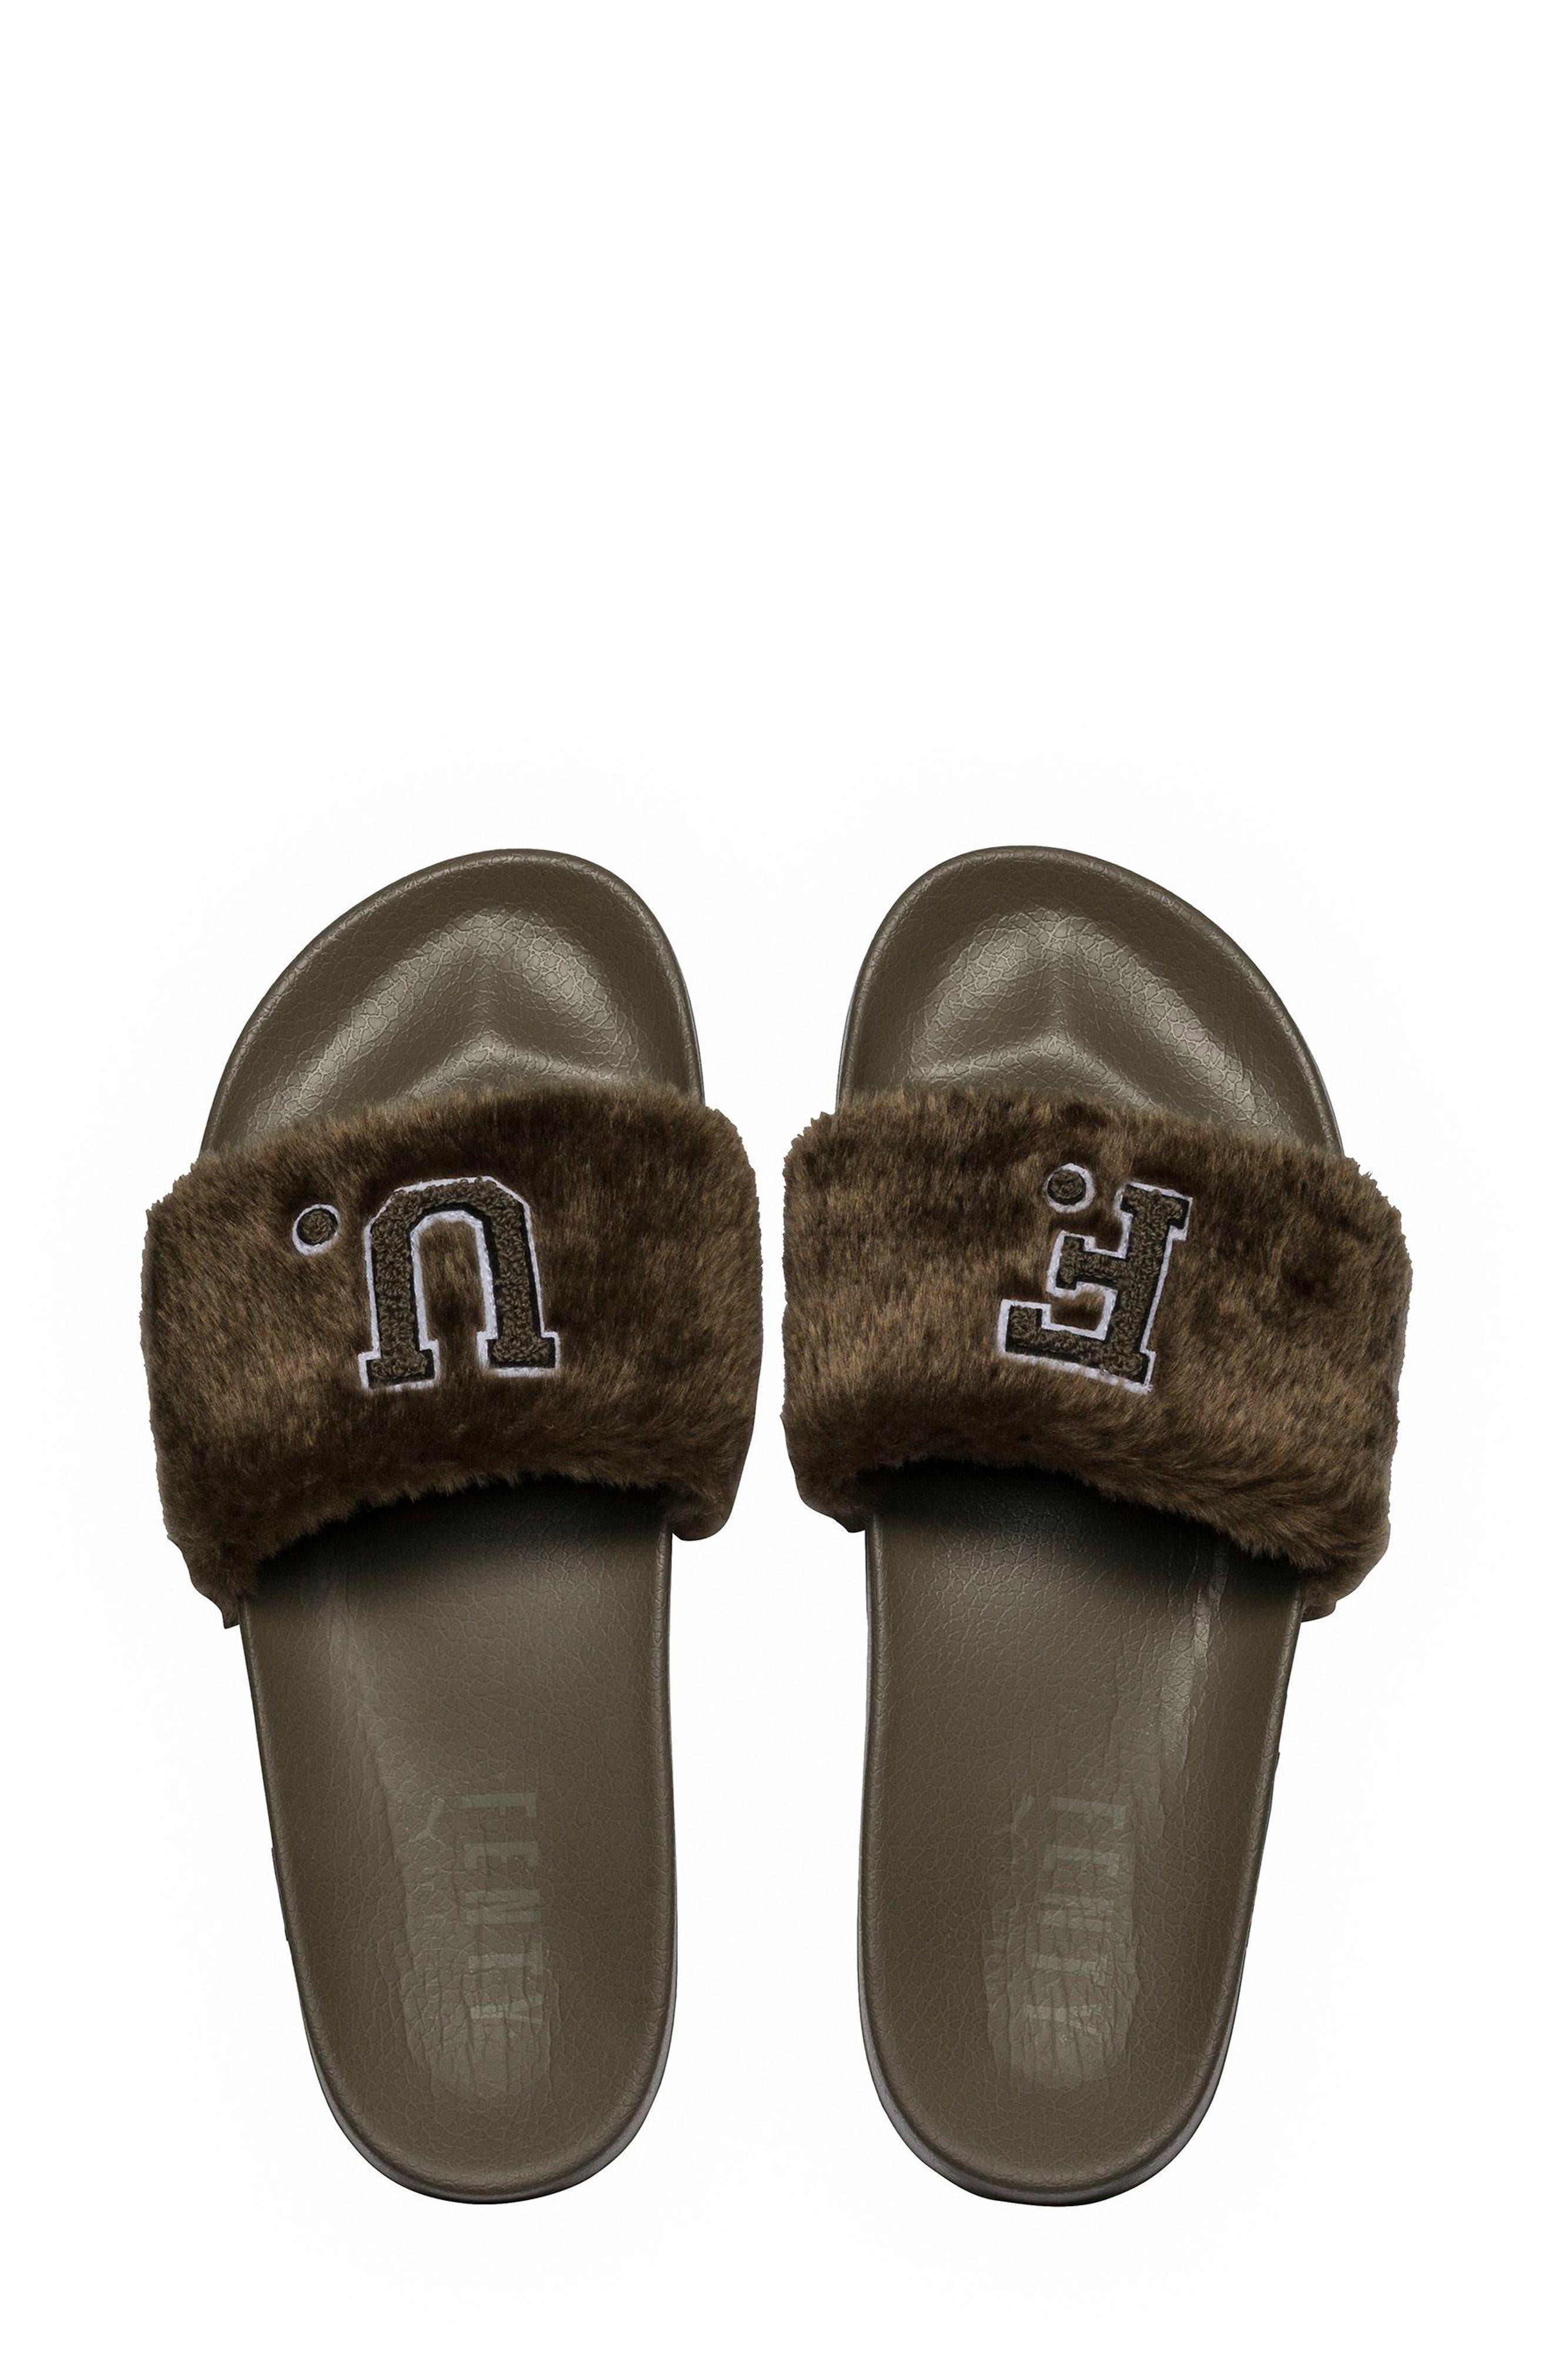 FENTY PUMA by Rihanna Lead Cat Slide Sandals,                             Alternate thumbnail 4, color,                             Burnt Olive - Puma Black